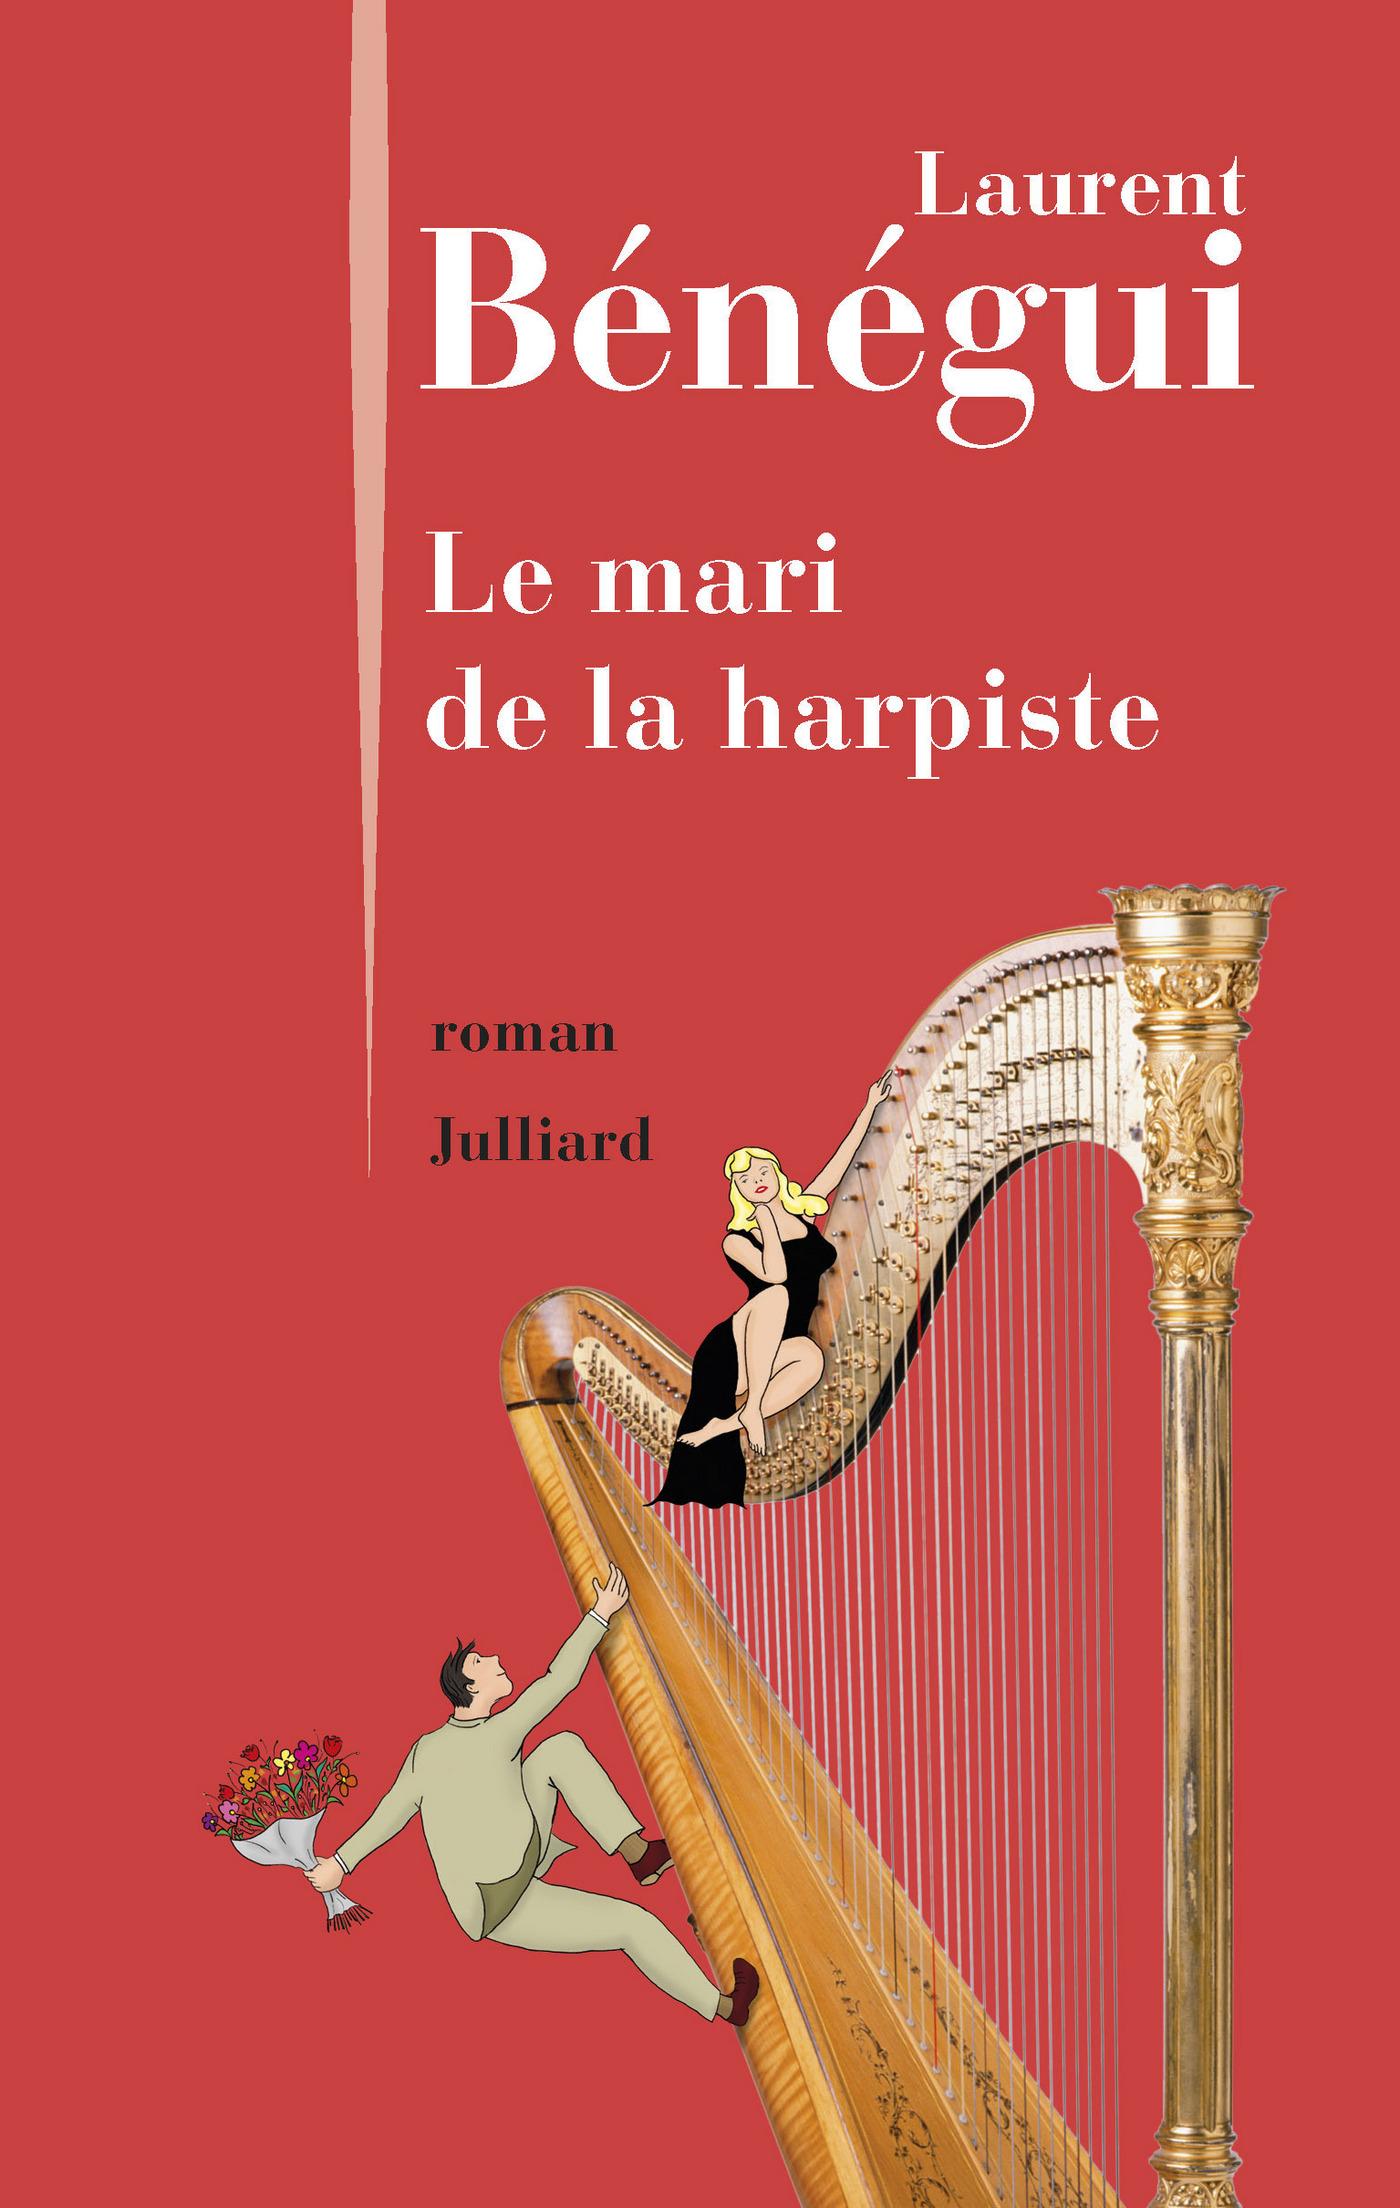 Le Mari de la harpiste